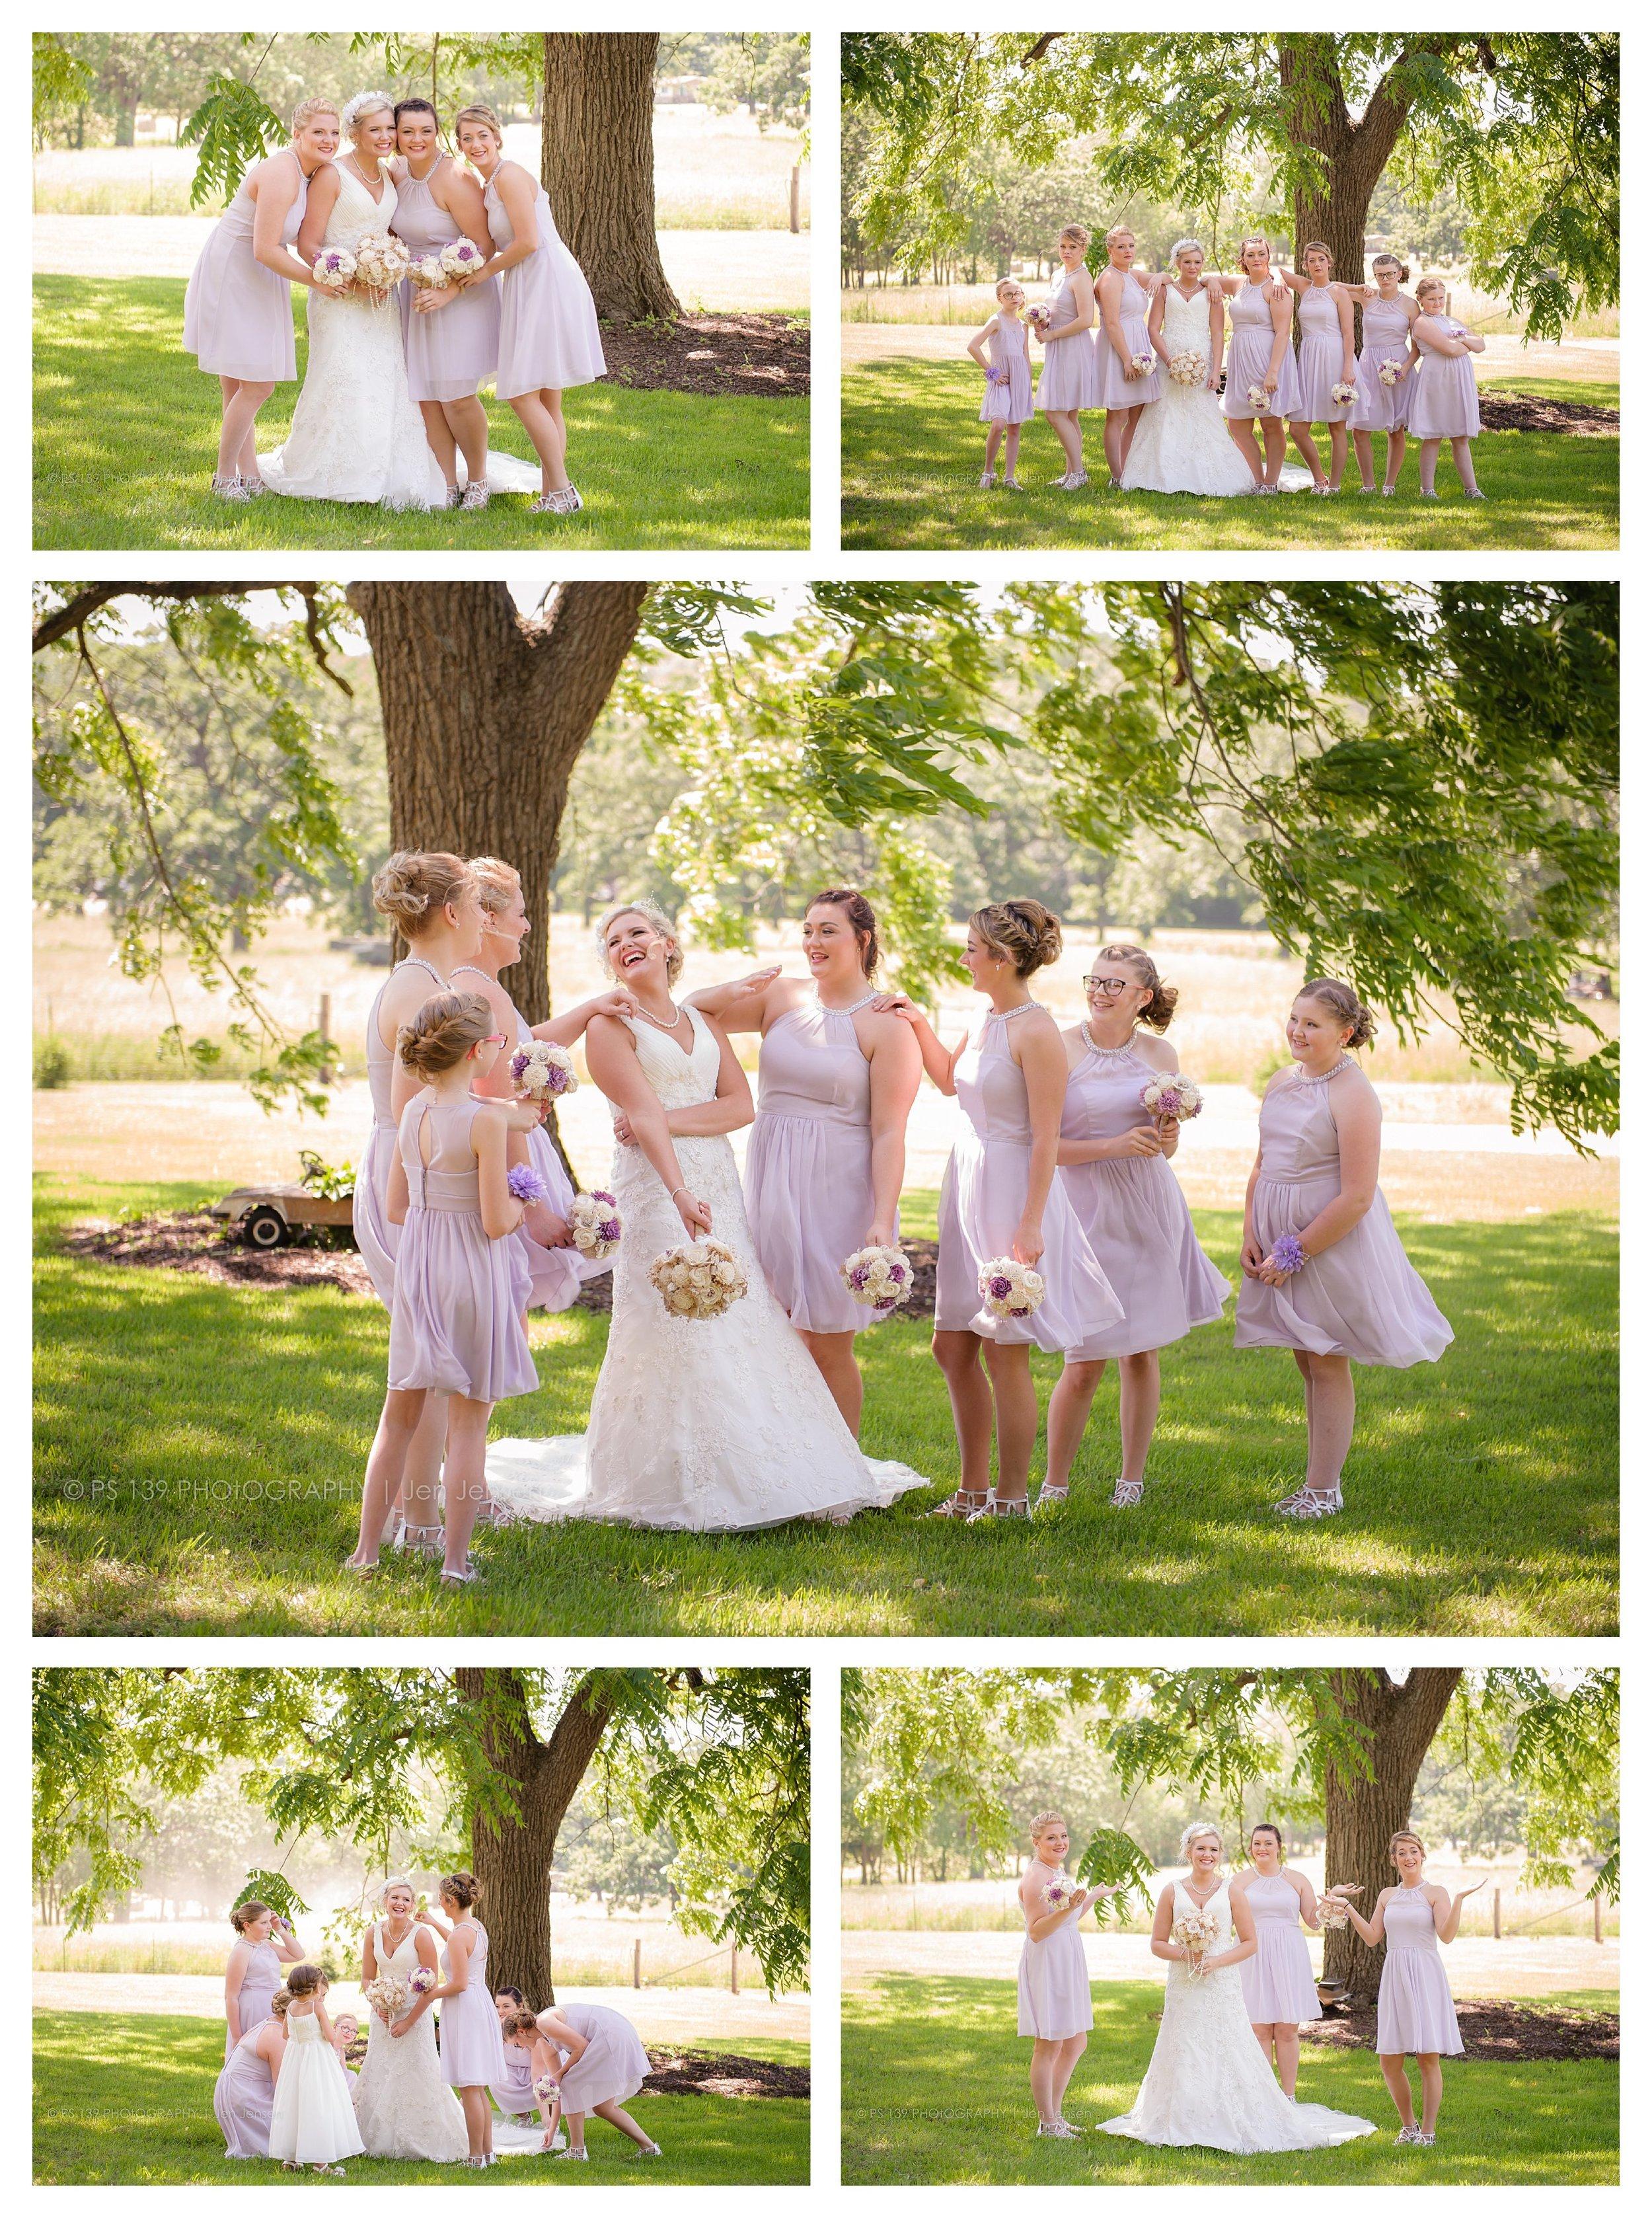 oregon Illinois oak lane farm wisconsin wedding photographer bayfield wi ps 139 photography jen jensen_0243.jpg